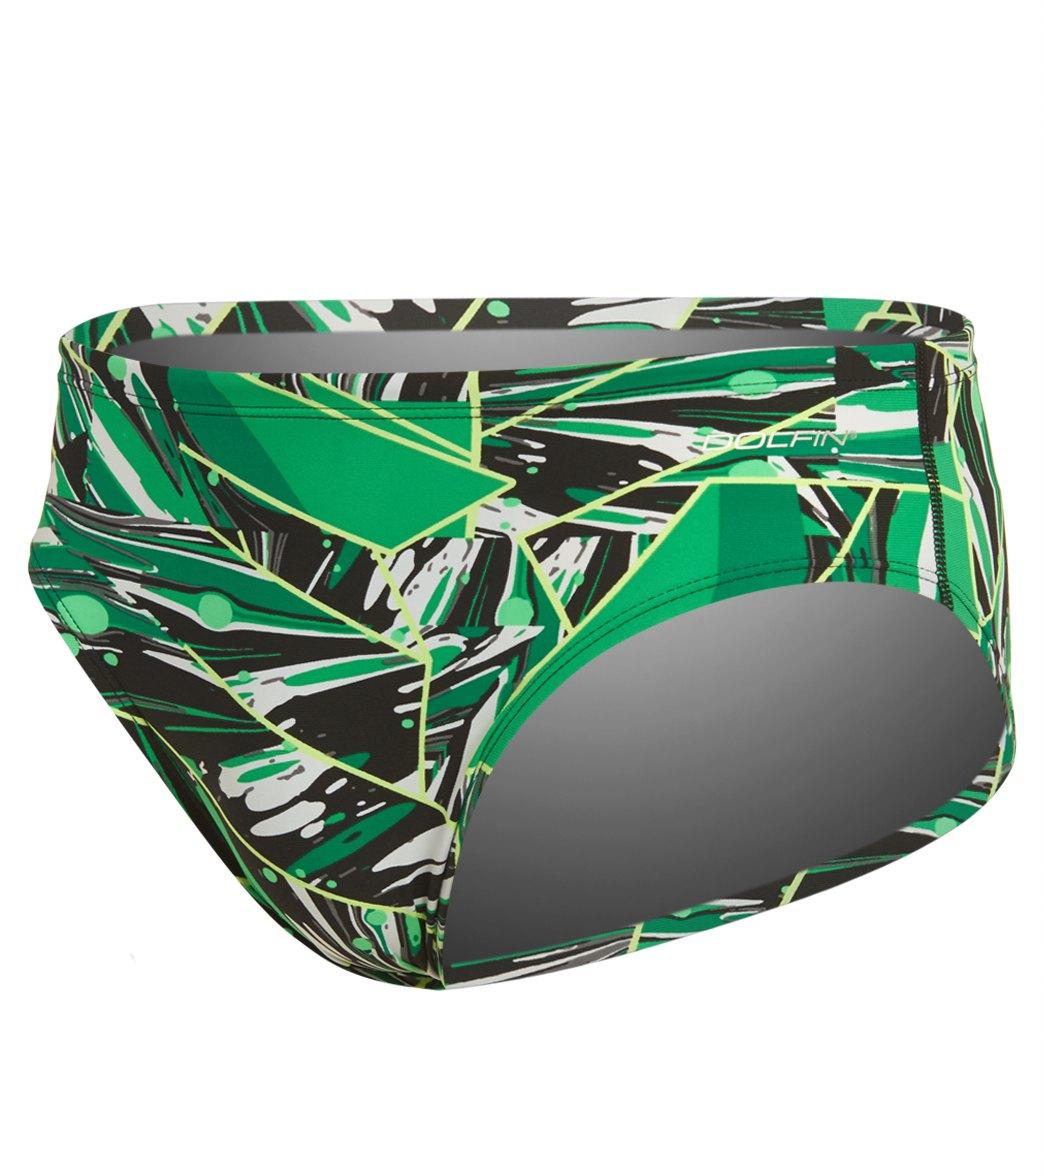 e48f741040 Dolfin Graphlite Men's Vantage All Over Racer Brief Swimsuit at  SwimOutlet.com